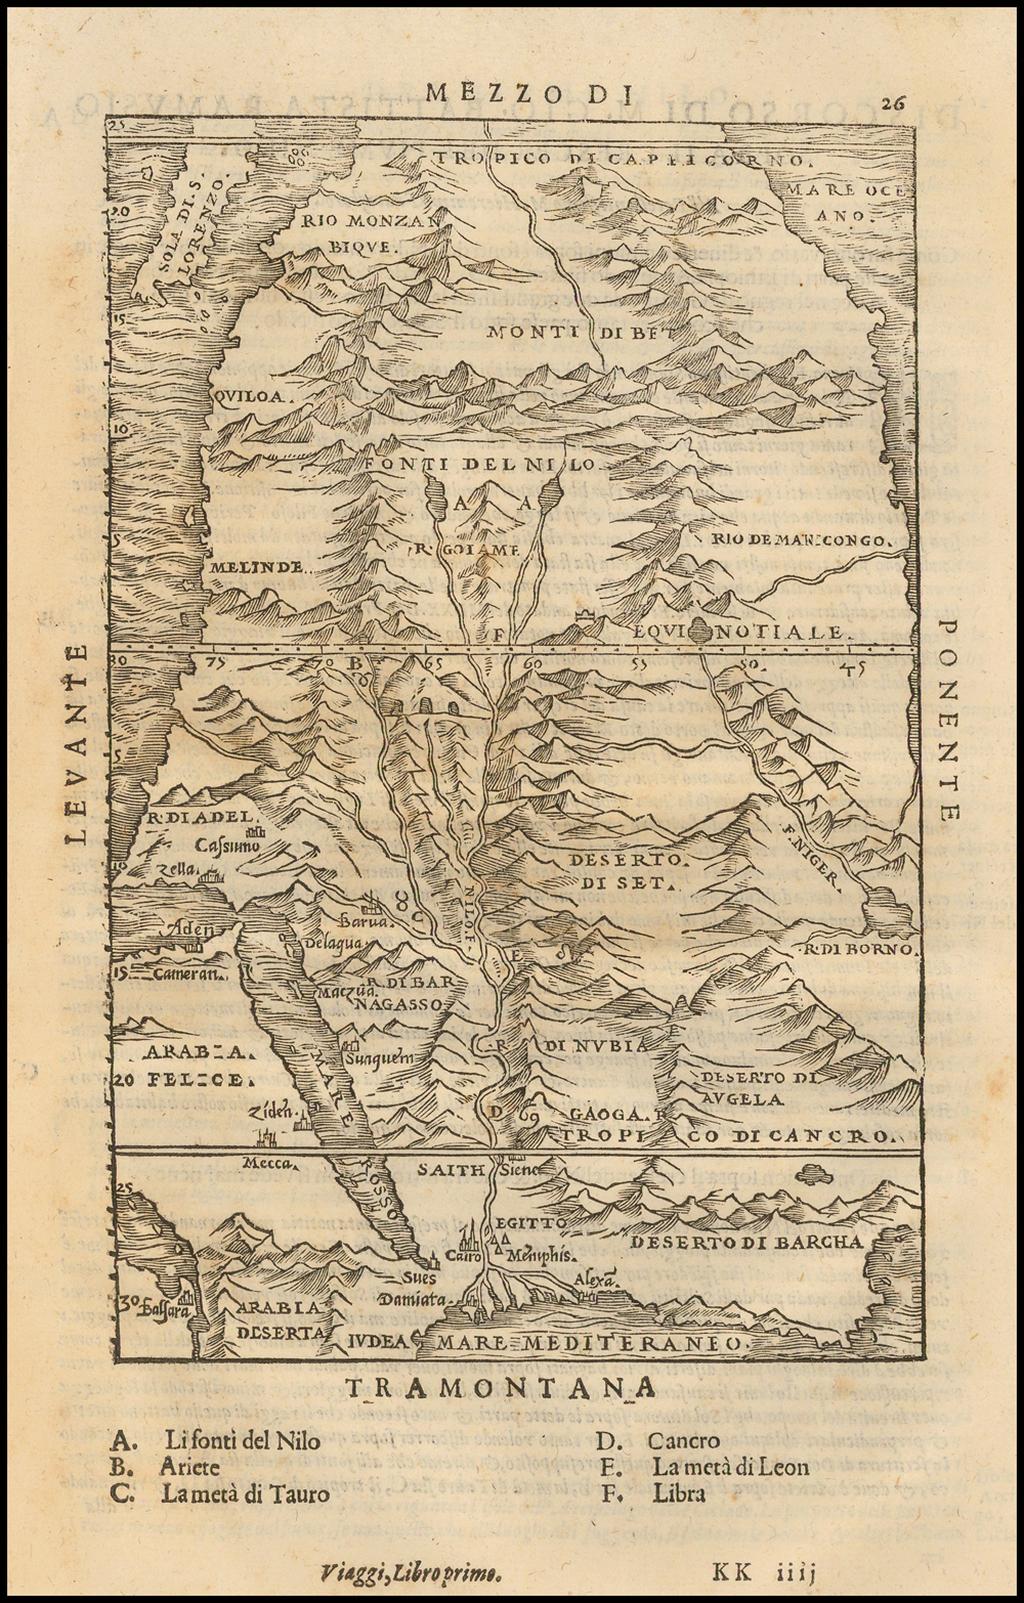 [Untitled Map Africa, Red Sea and Saudi Peninsula] By Giovanni Battista Ramusio